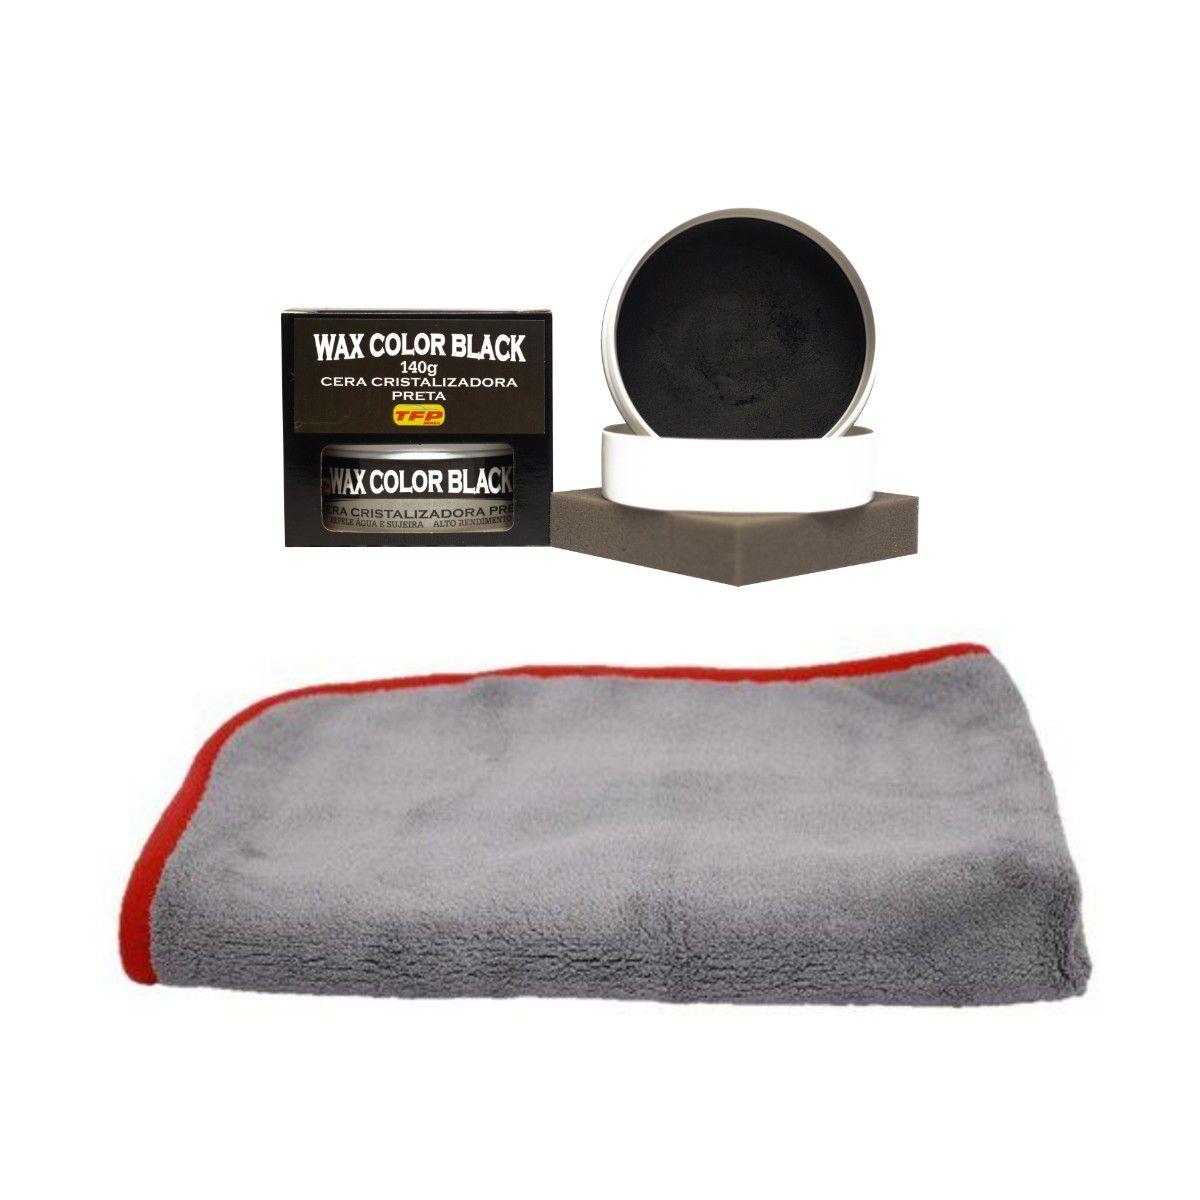 Cera Cristalizadora Wax Color Black Carros Escuros + Flanela Microfibra